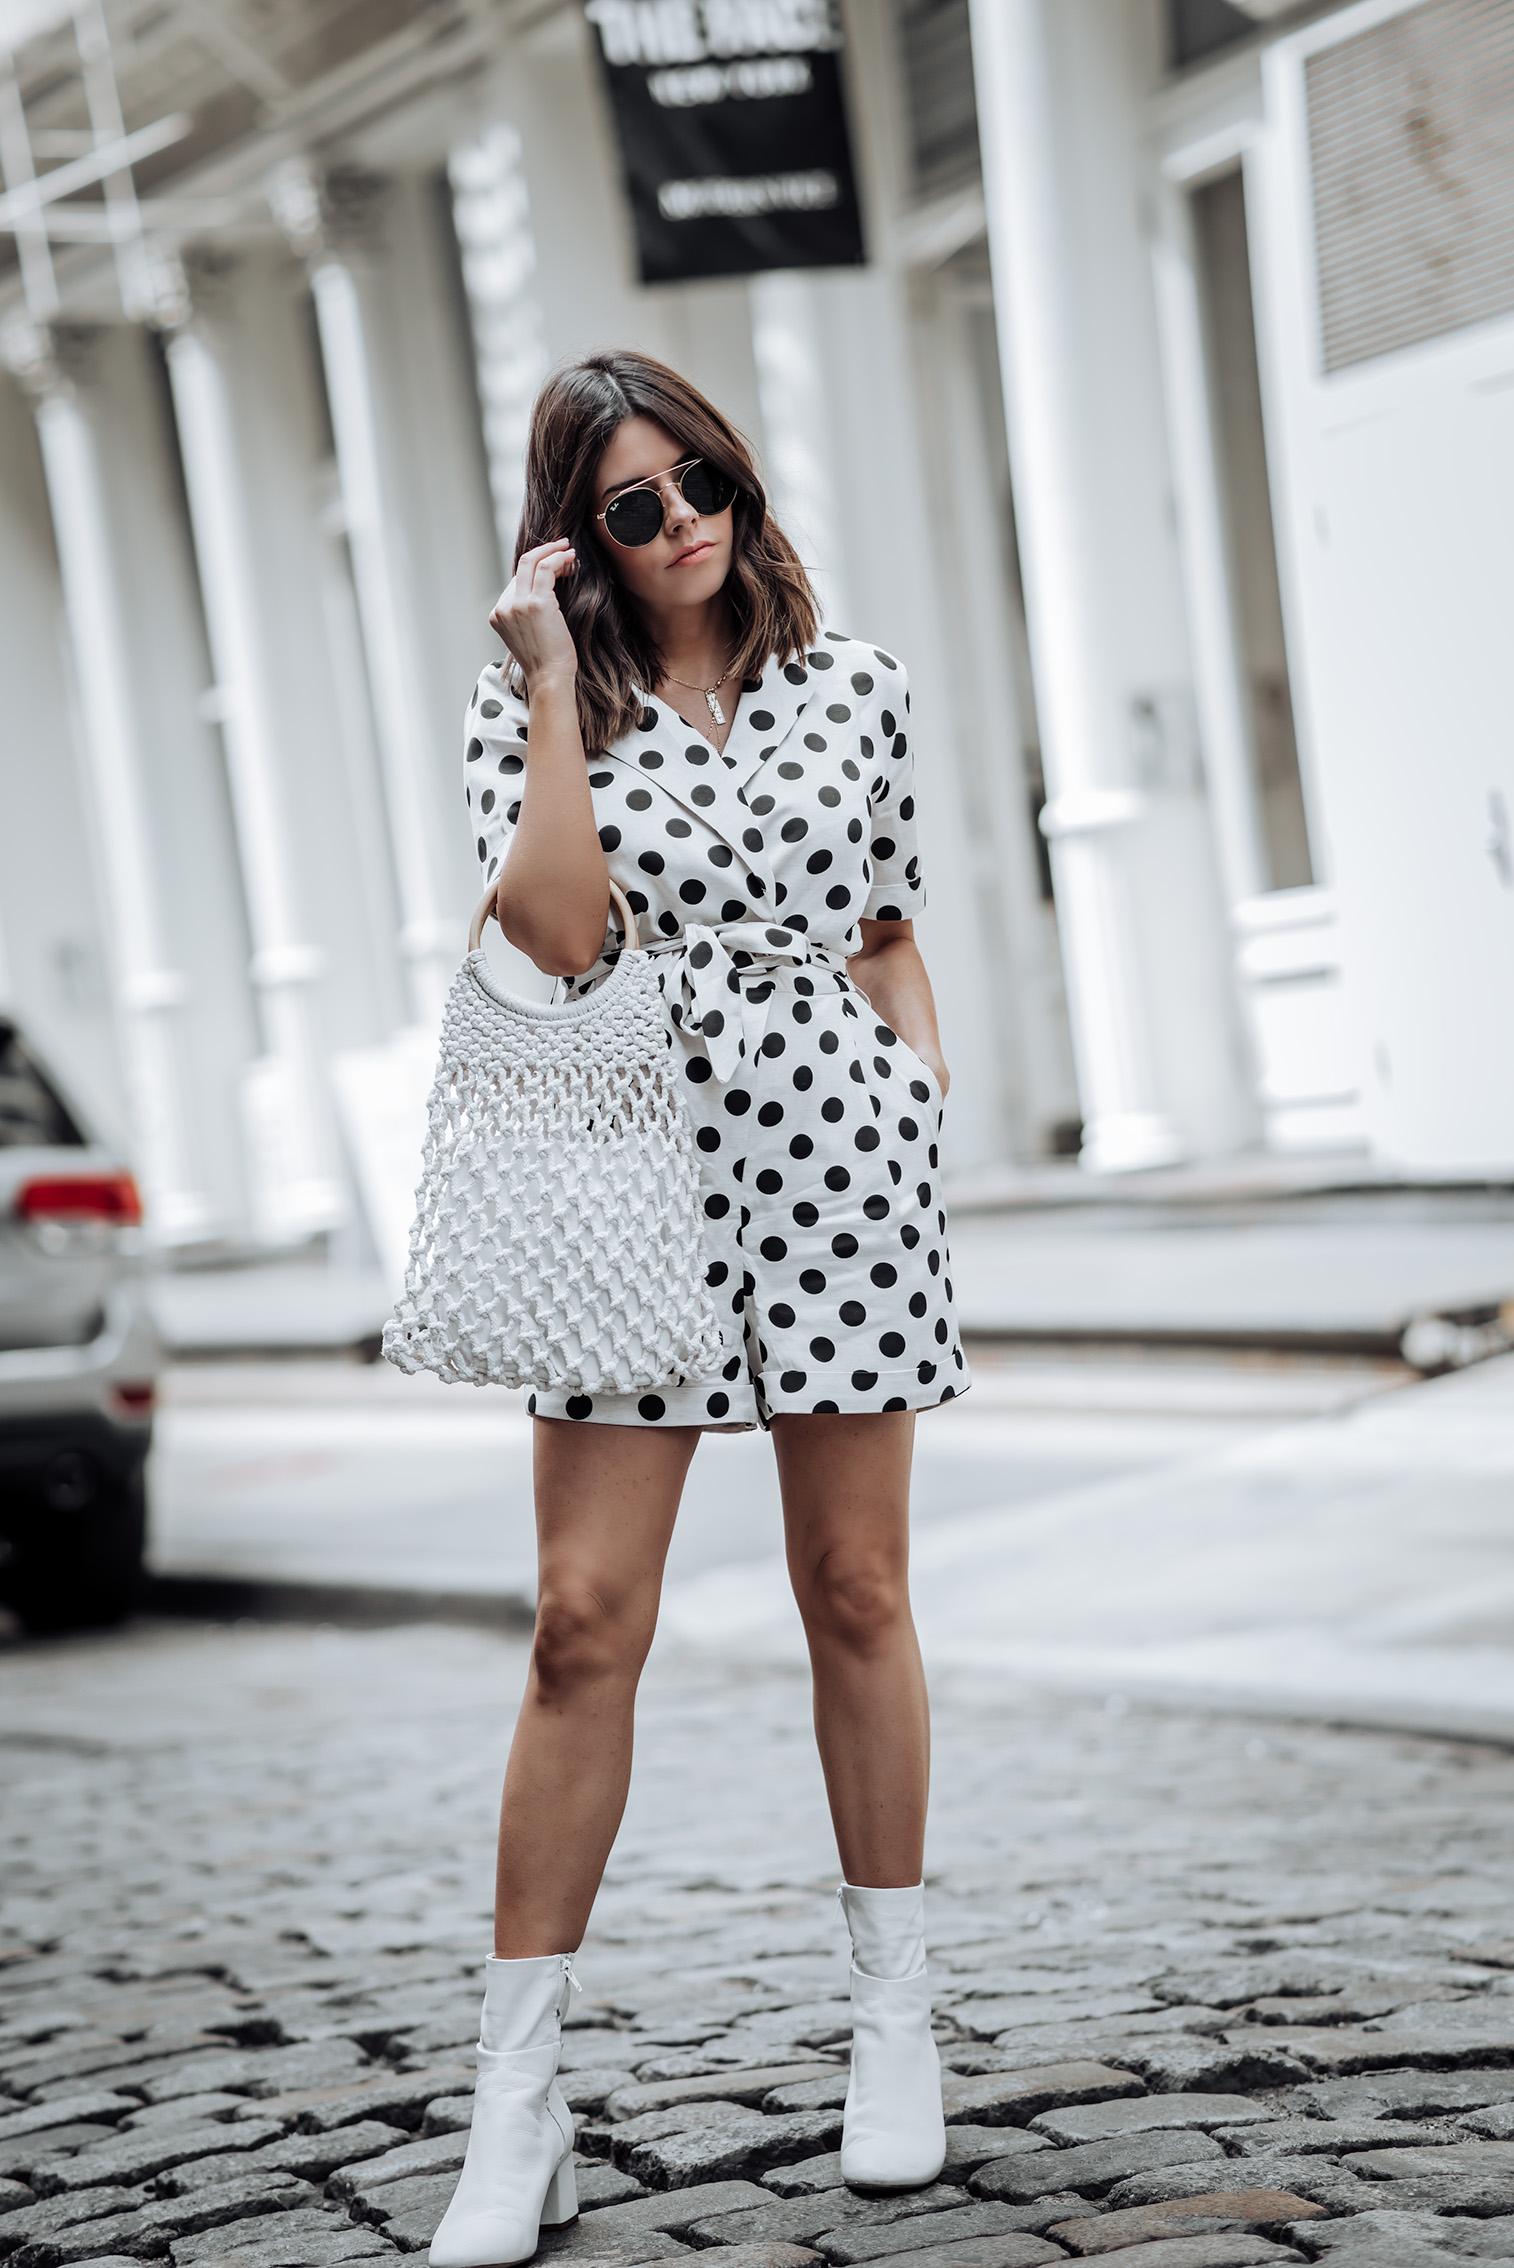 Polka Dot Romer via TOPSHOP   Ankle Boots   Handbang  #topshopstyle #streetstyle #polkadotoutfits